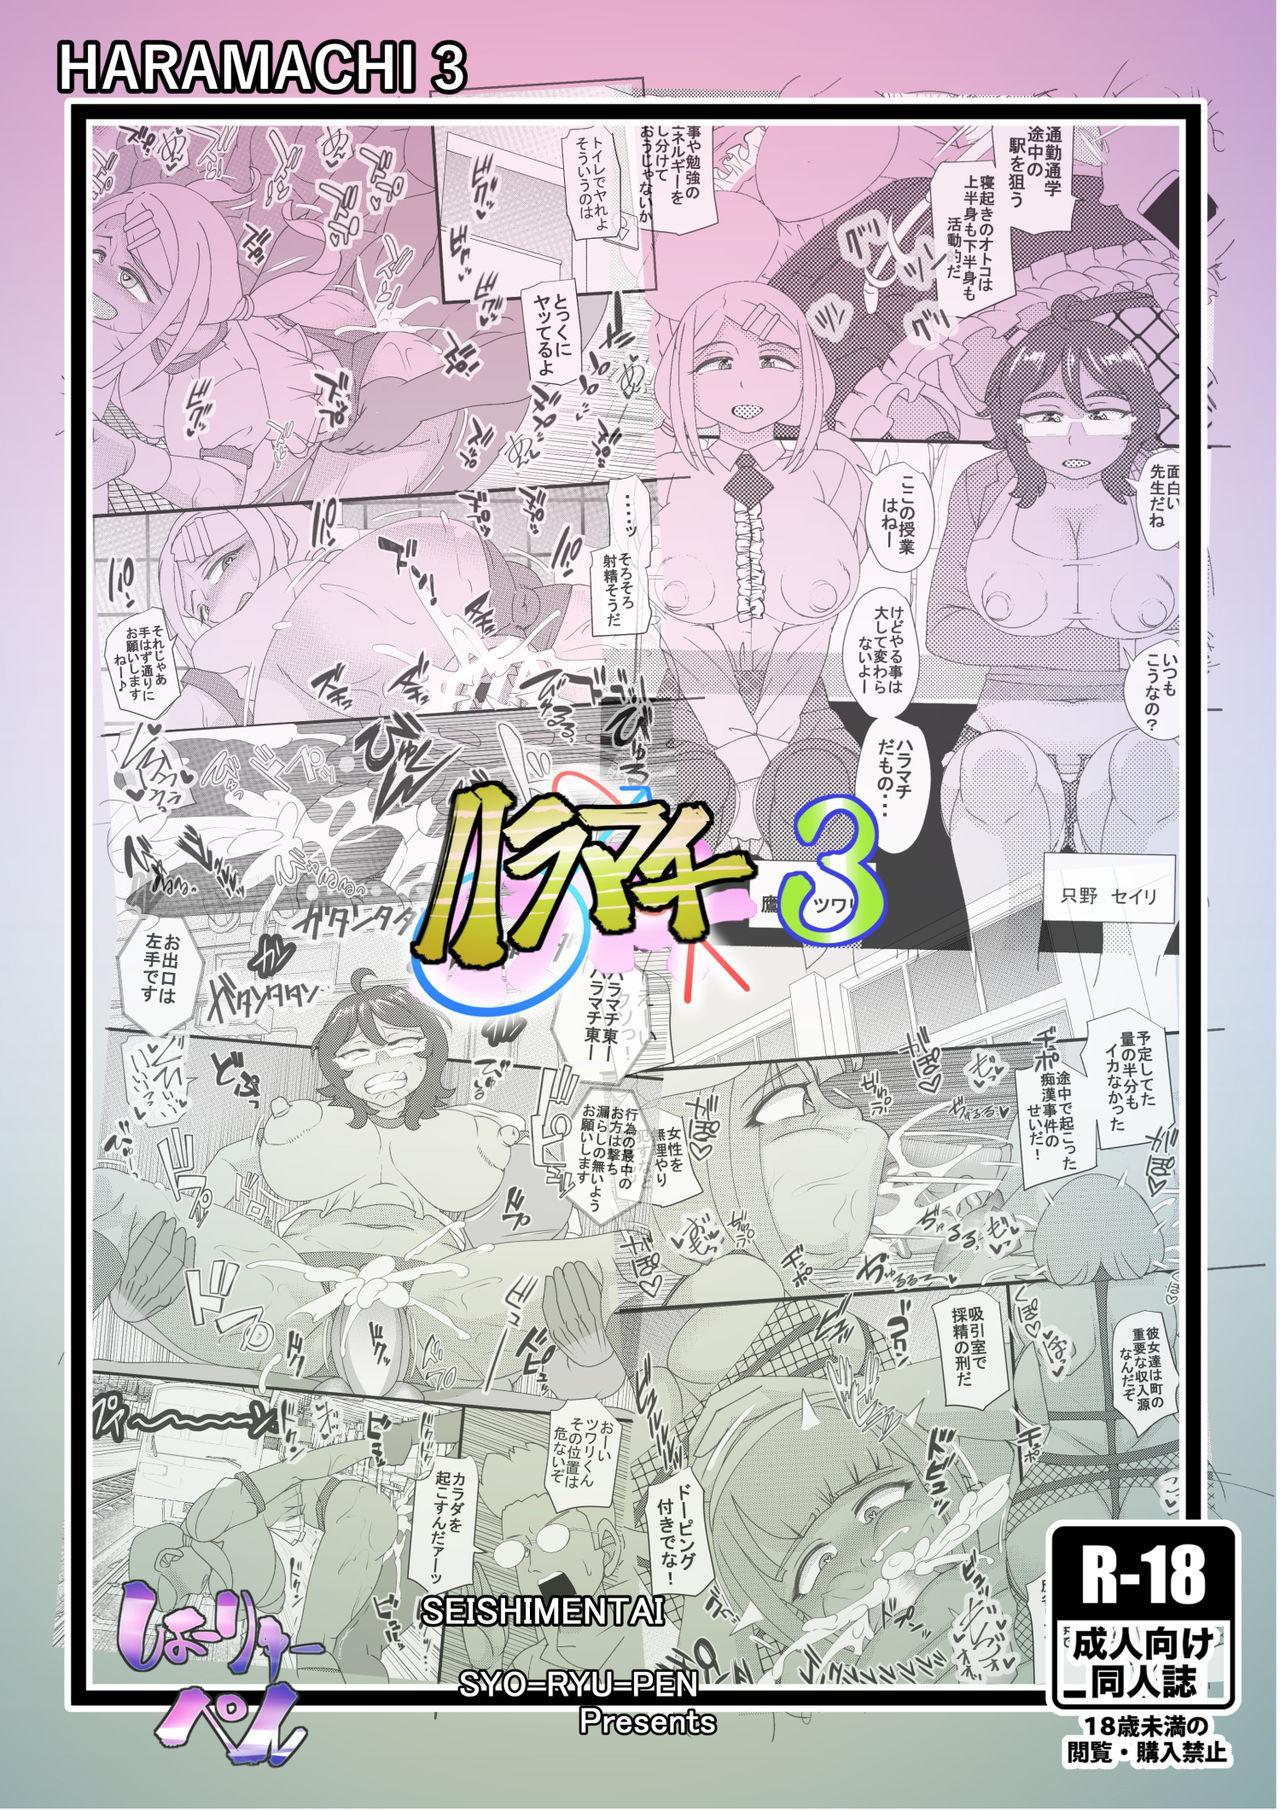 Haramachi 3 29